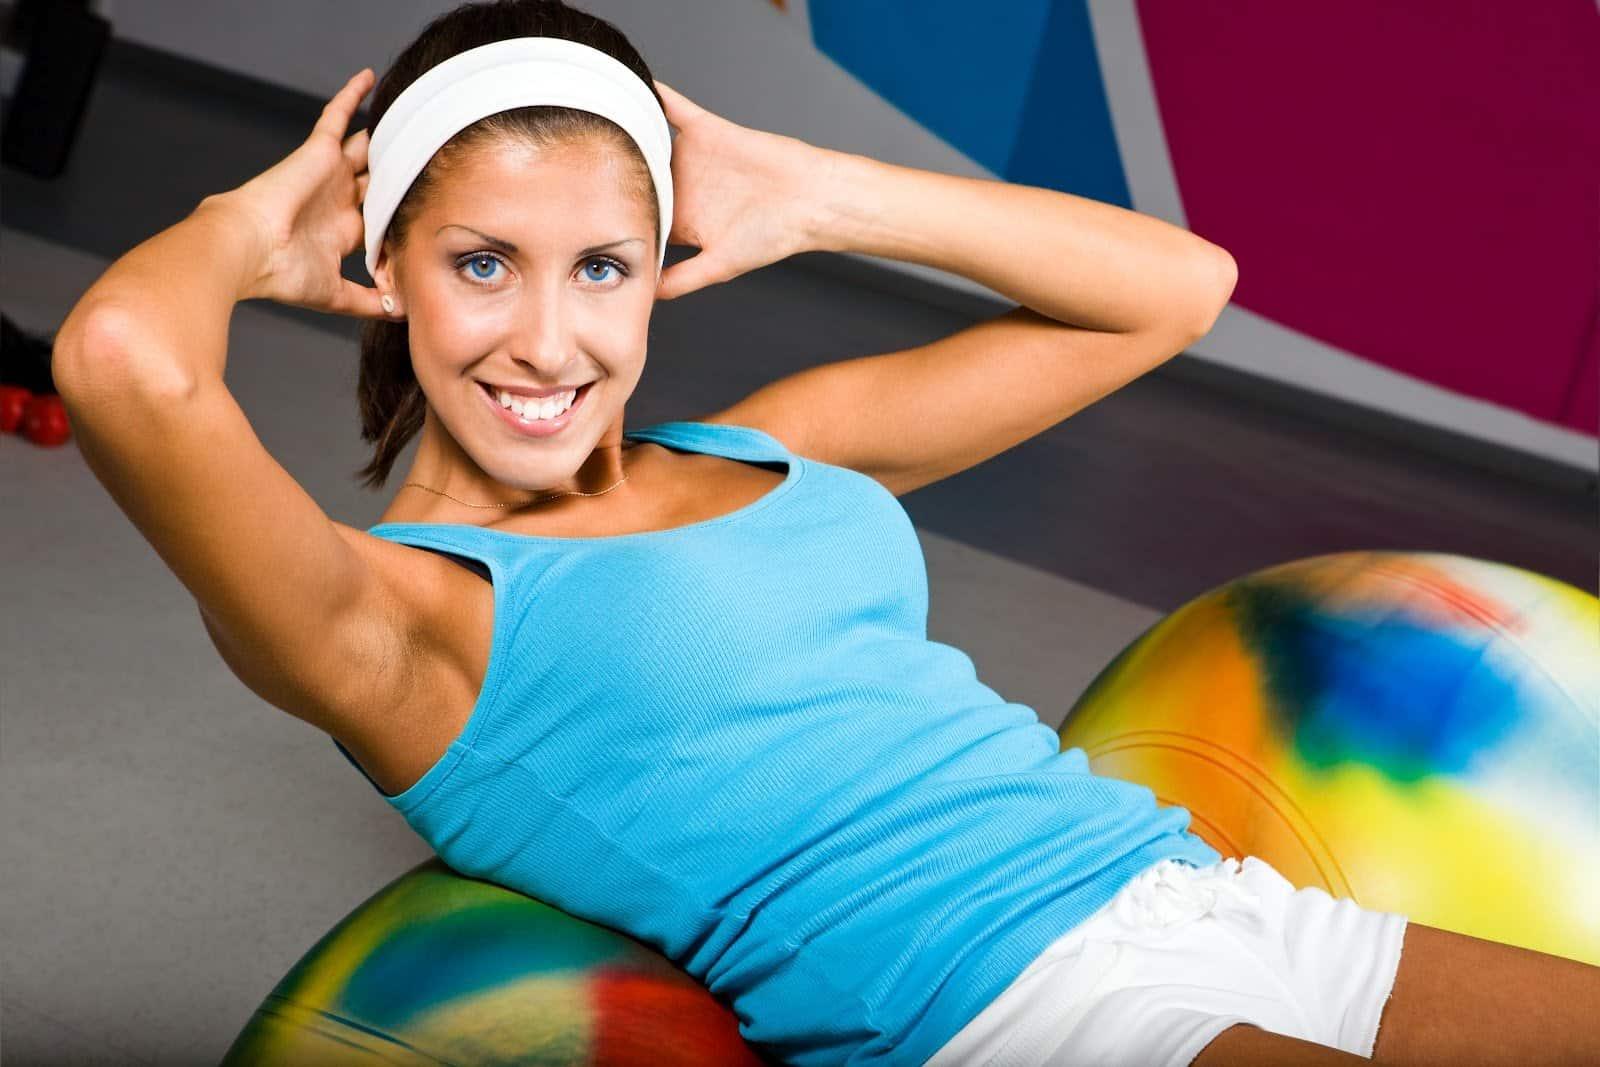 Необходимо регулярно заниматься спортом